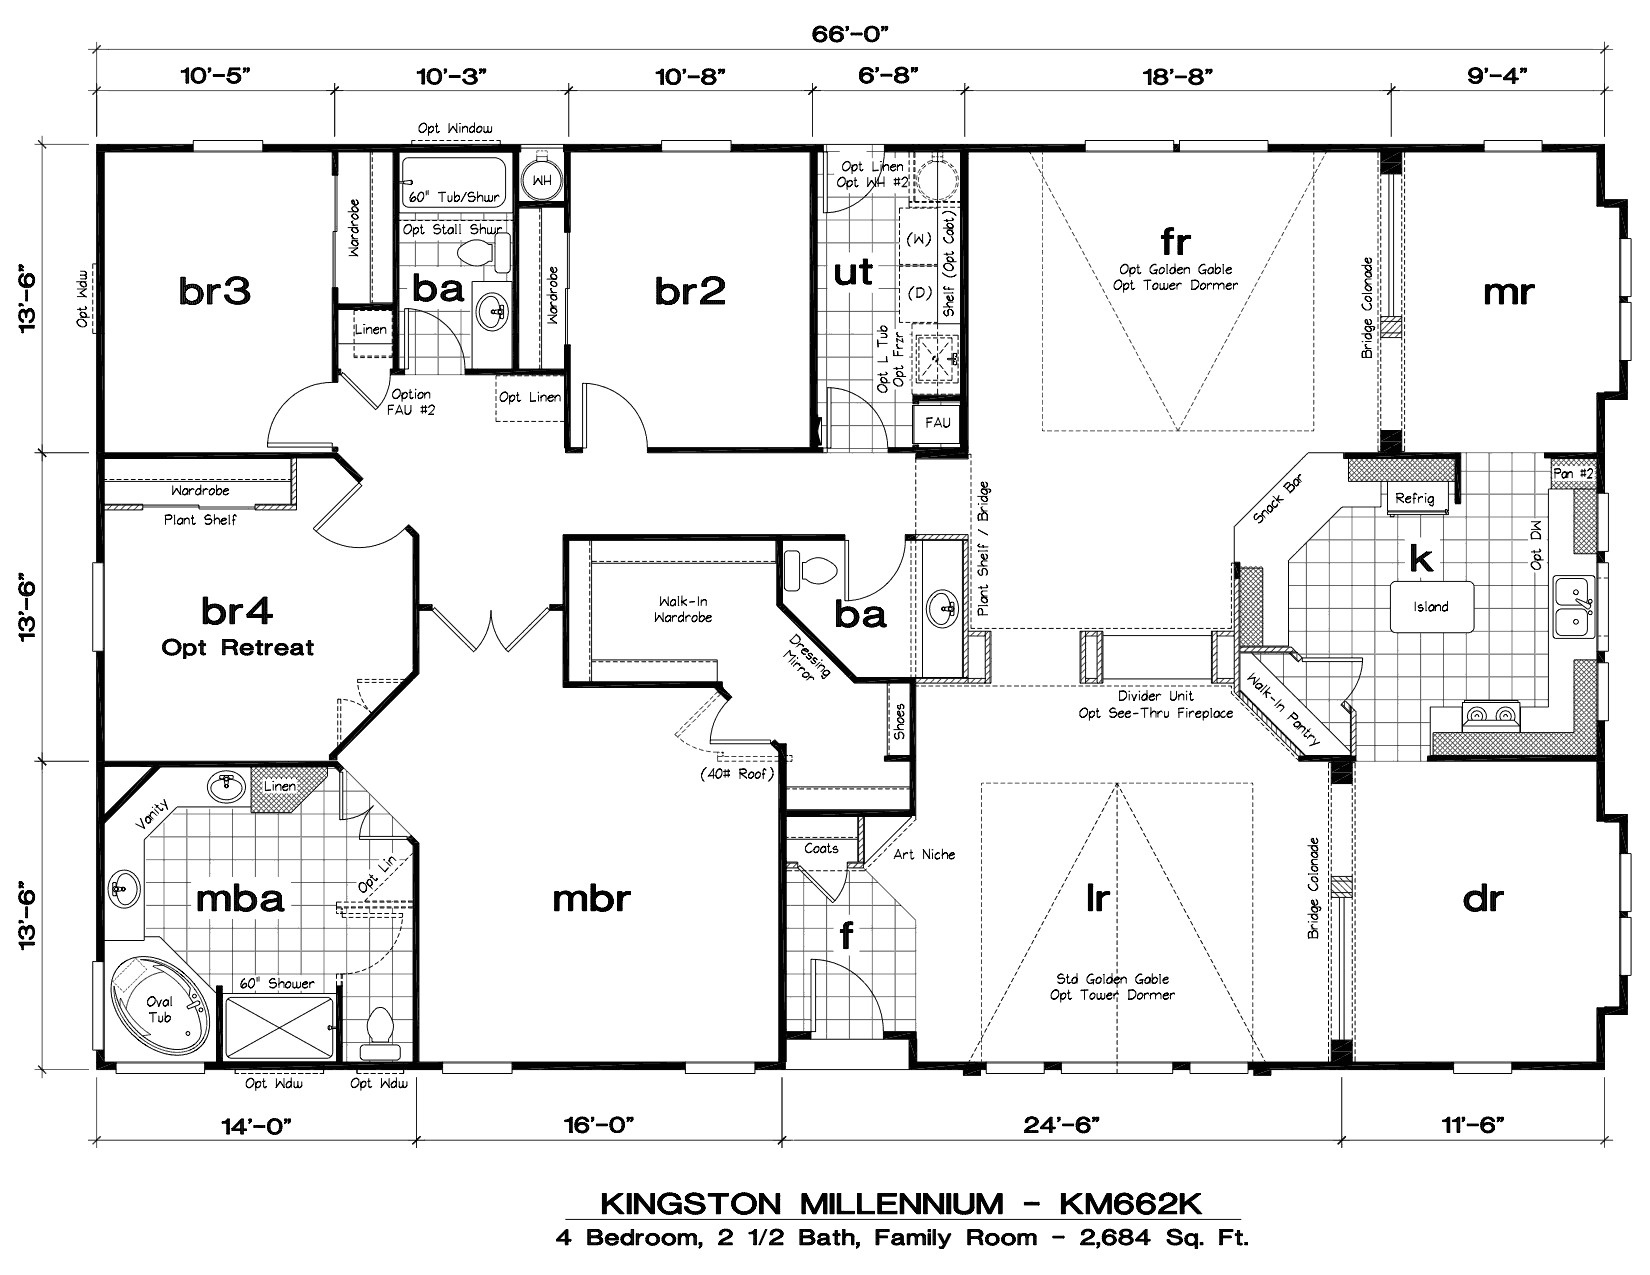 modular home floor plans florida best of manufactured homes marlette floor plans home triple wide the la